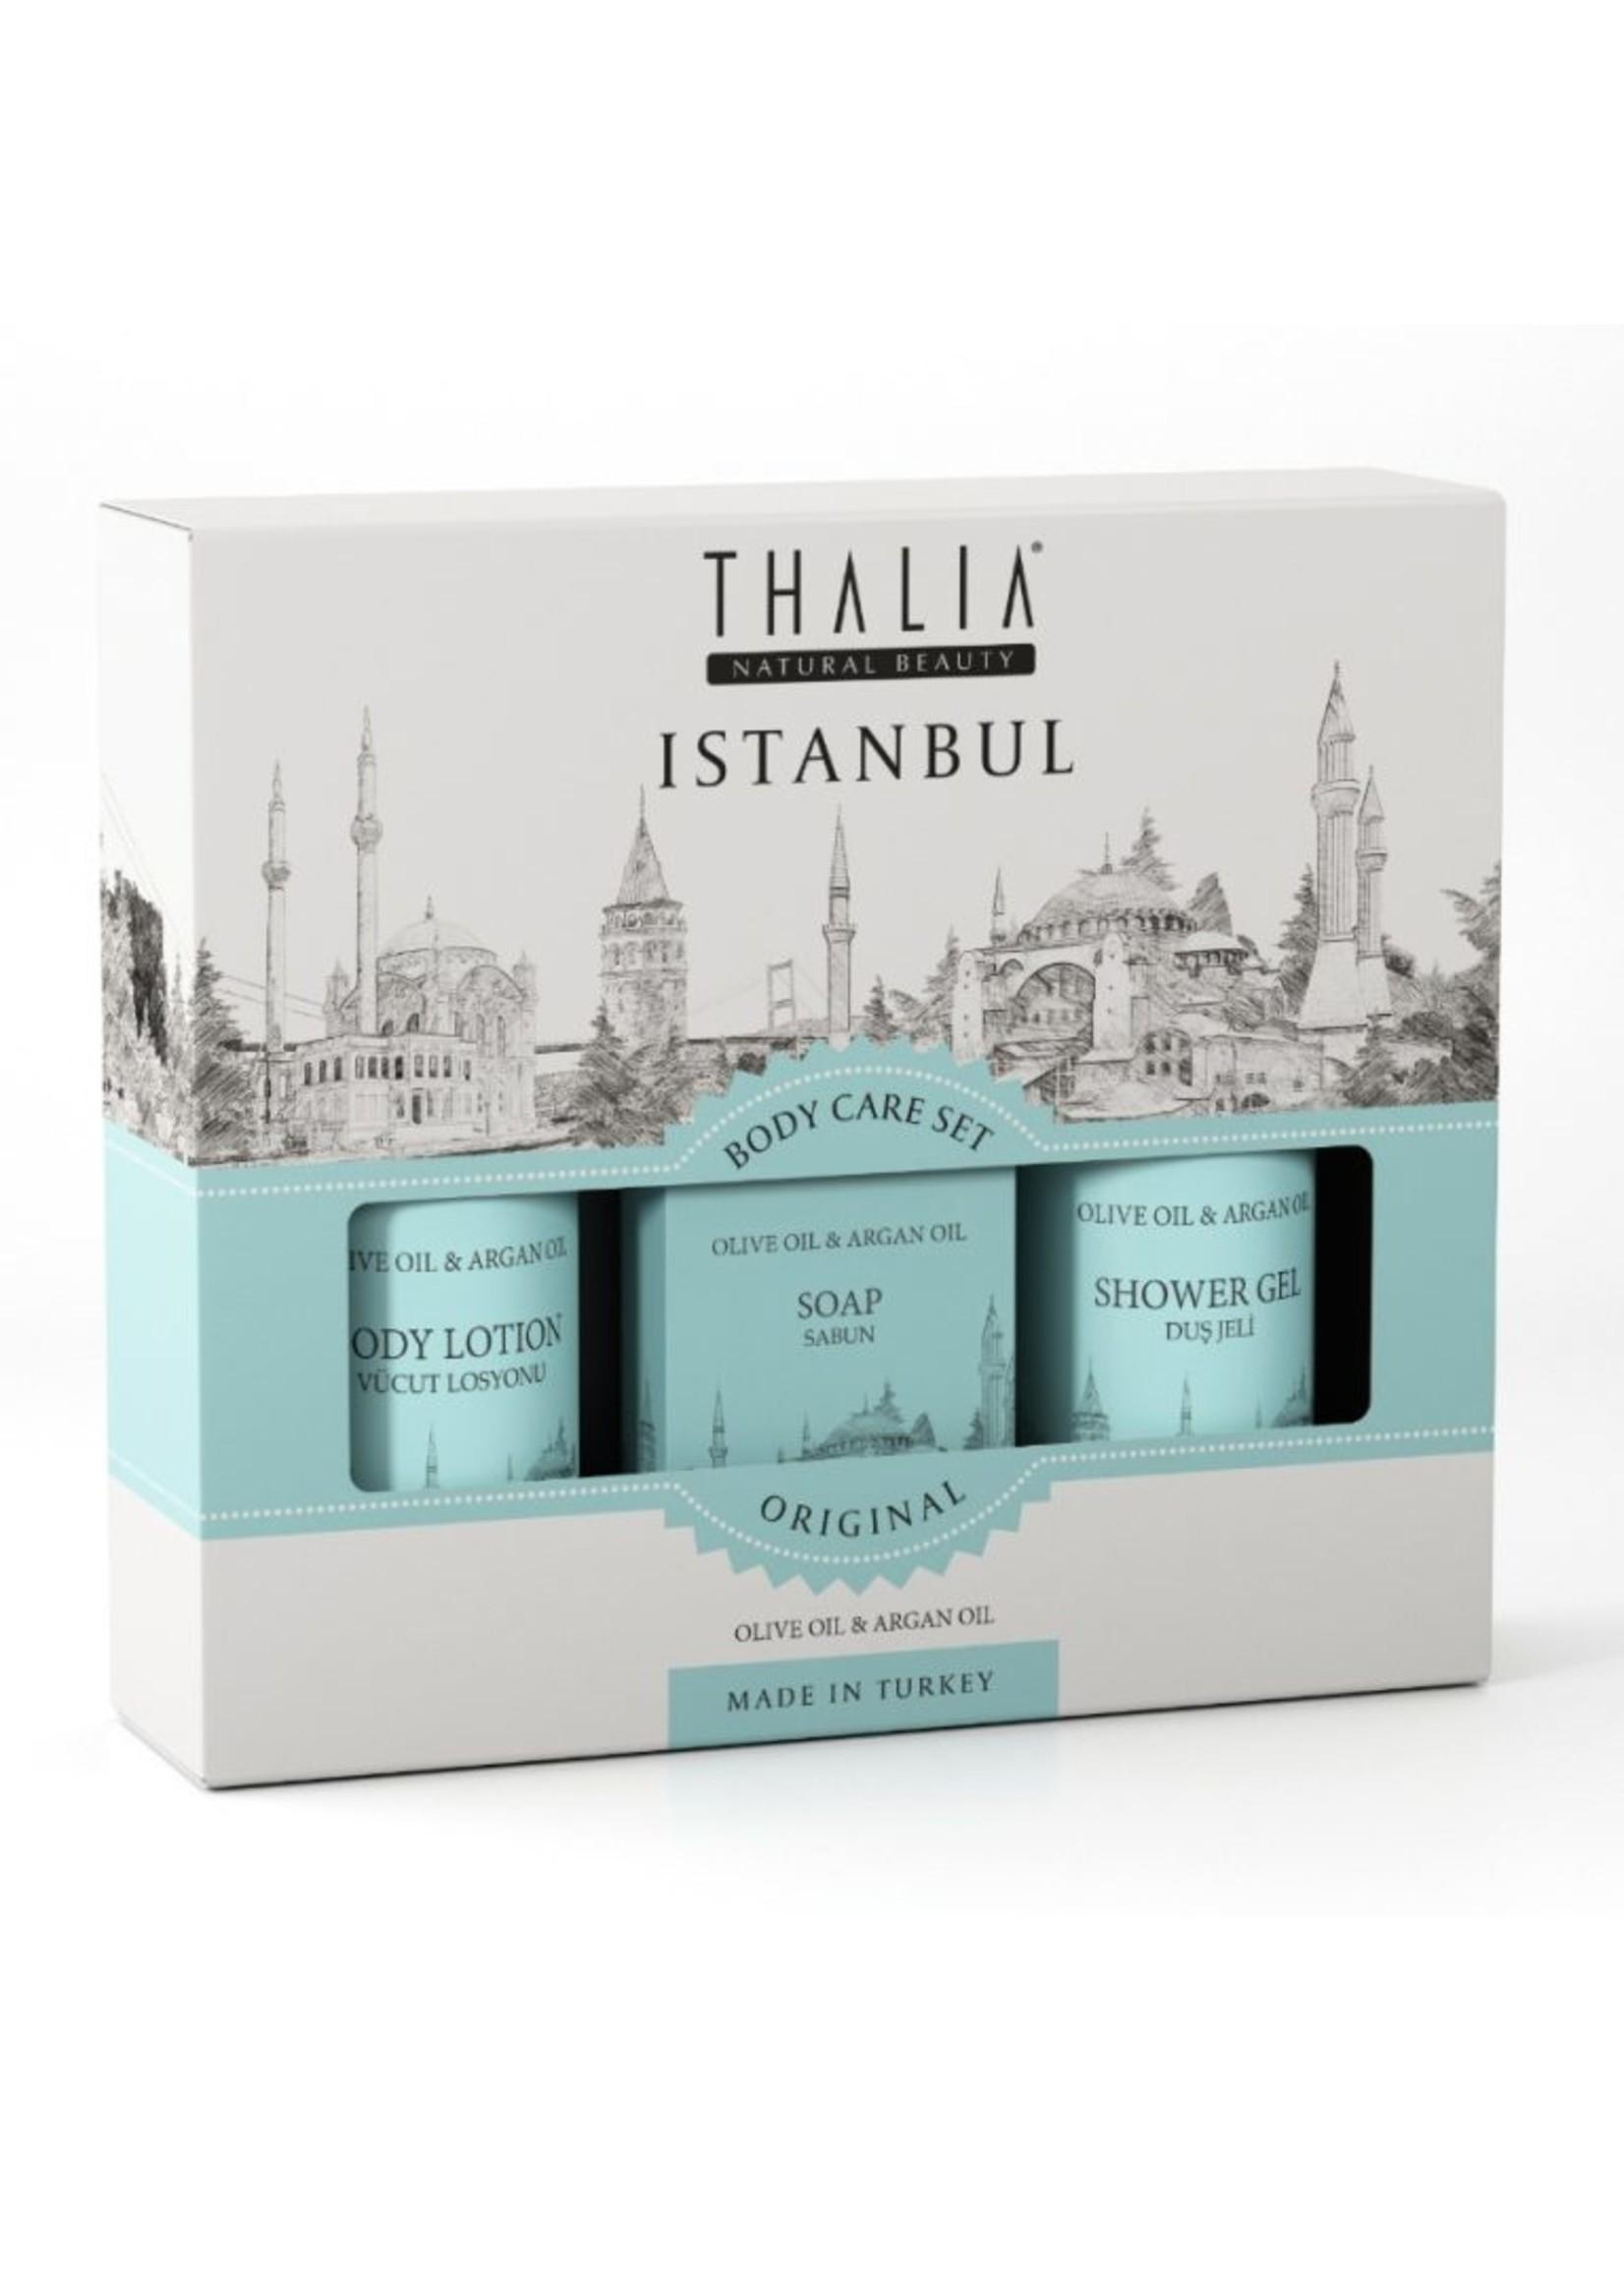 Thalia Travel Set Istanbul (lichaamsverzorging)